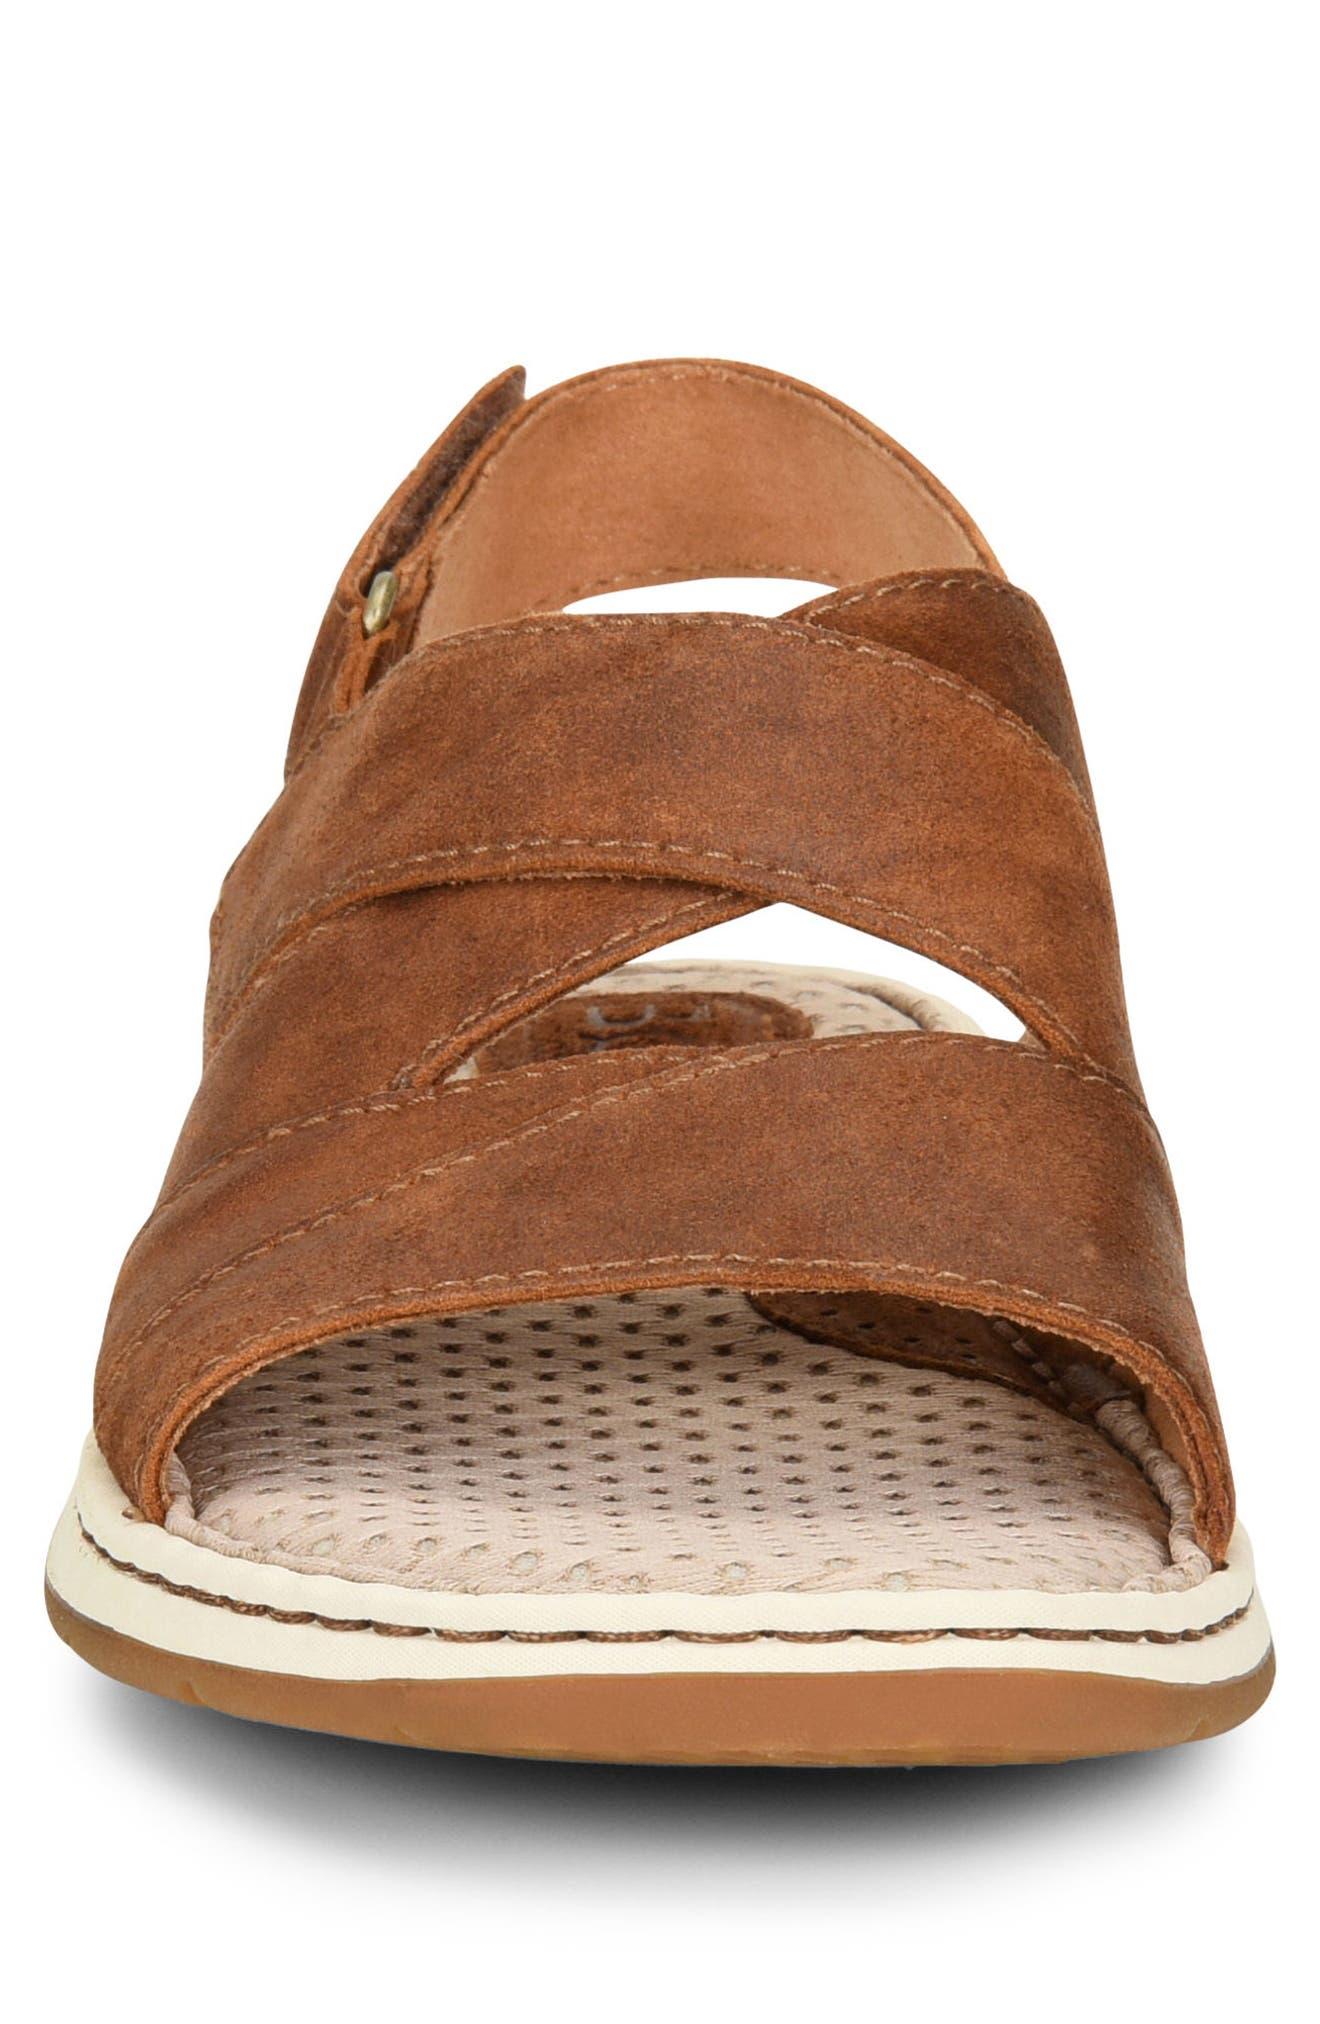 Shell Cross Strap Sandal,                             Alternate thumbnail 4, color,                             Rust Leather